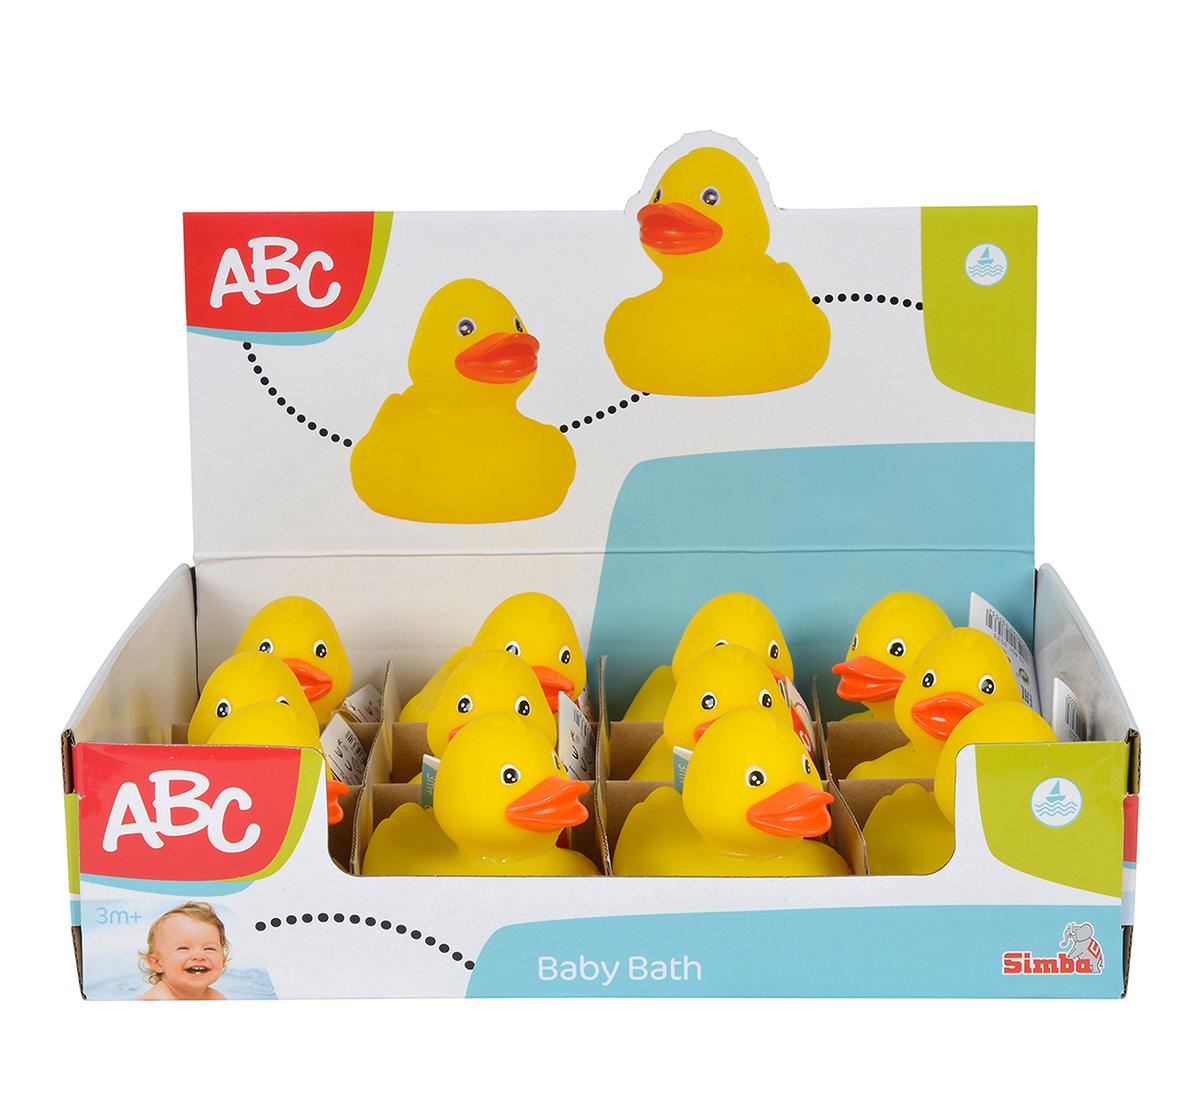 Simba | Simba Abc Rubber Ducks In Display Assorted, Unisex, 0M+ (Yellow)